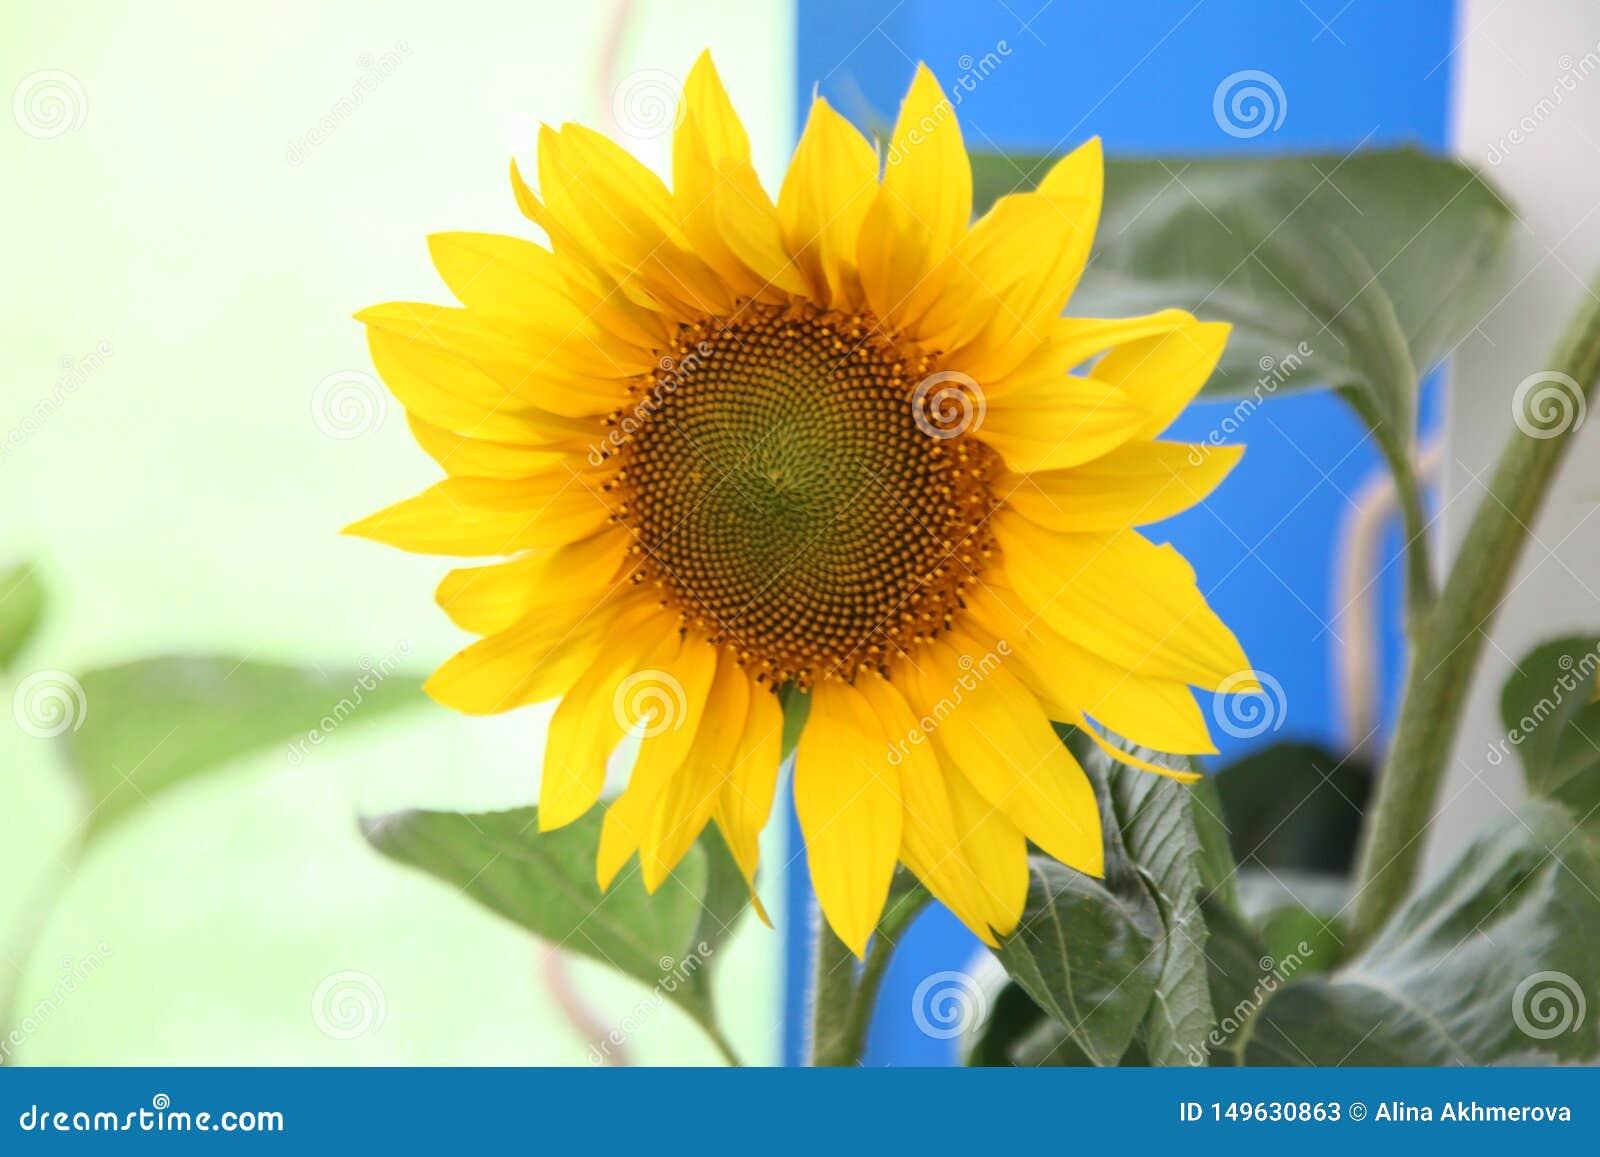 солнцецвет, солнце цветка, annuus подсолнечника, семена